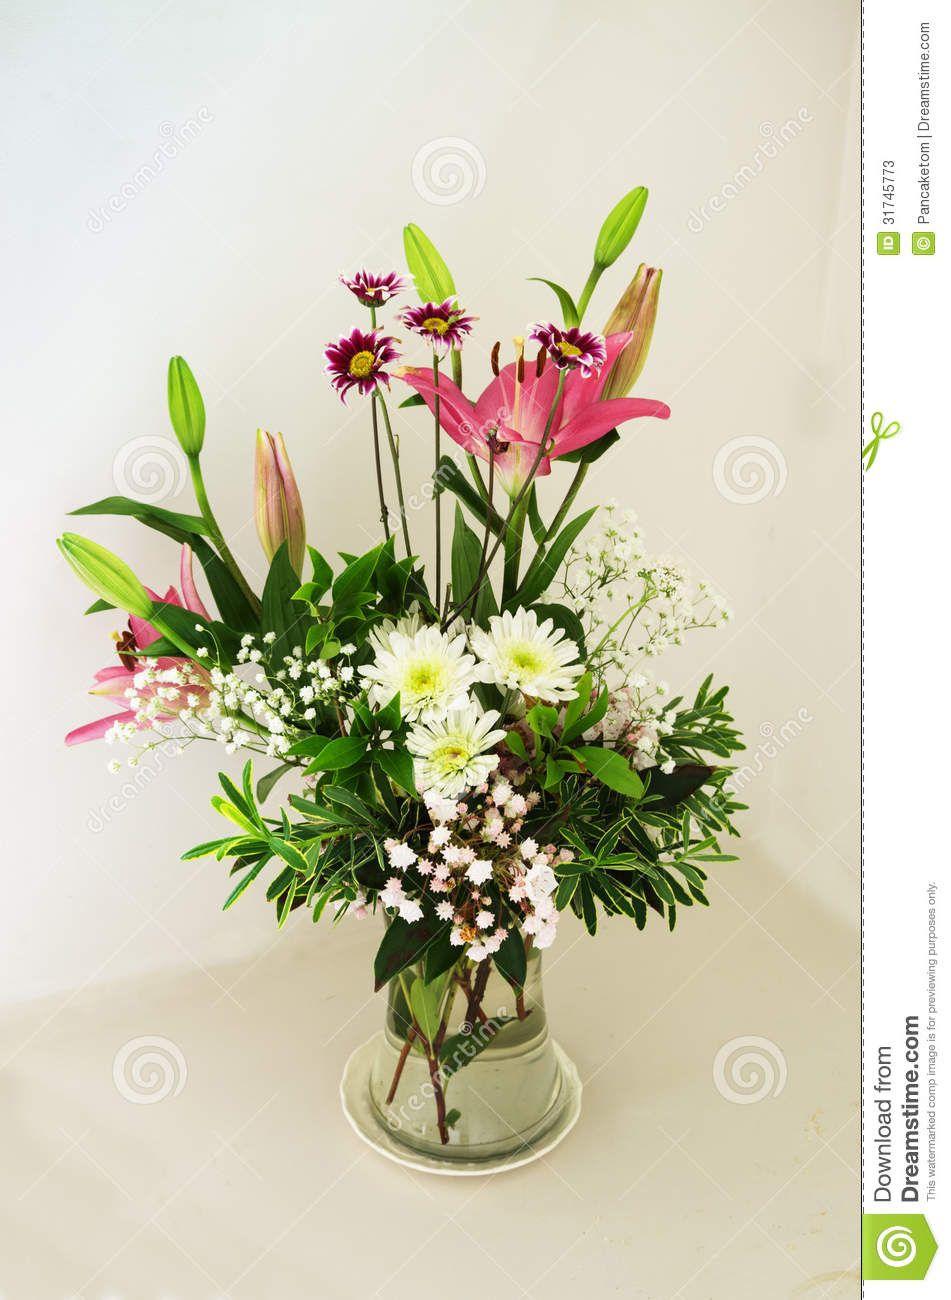 Daisy flower centerpieces stock flower images pinterest flower daisy flower centerpieces izmirmasajfo